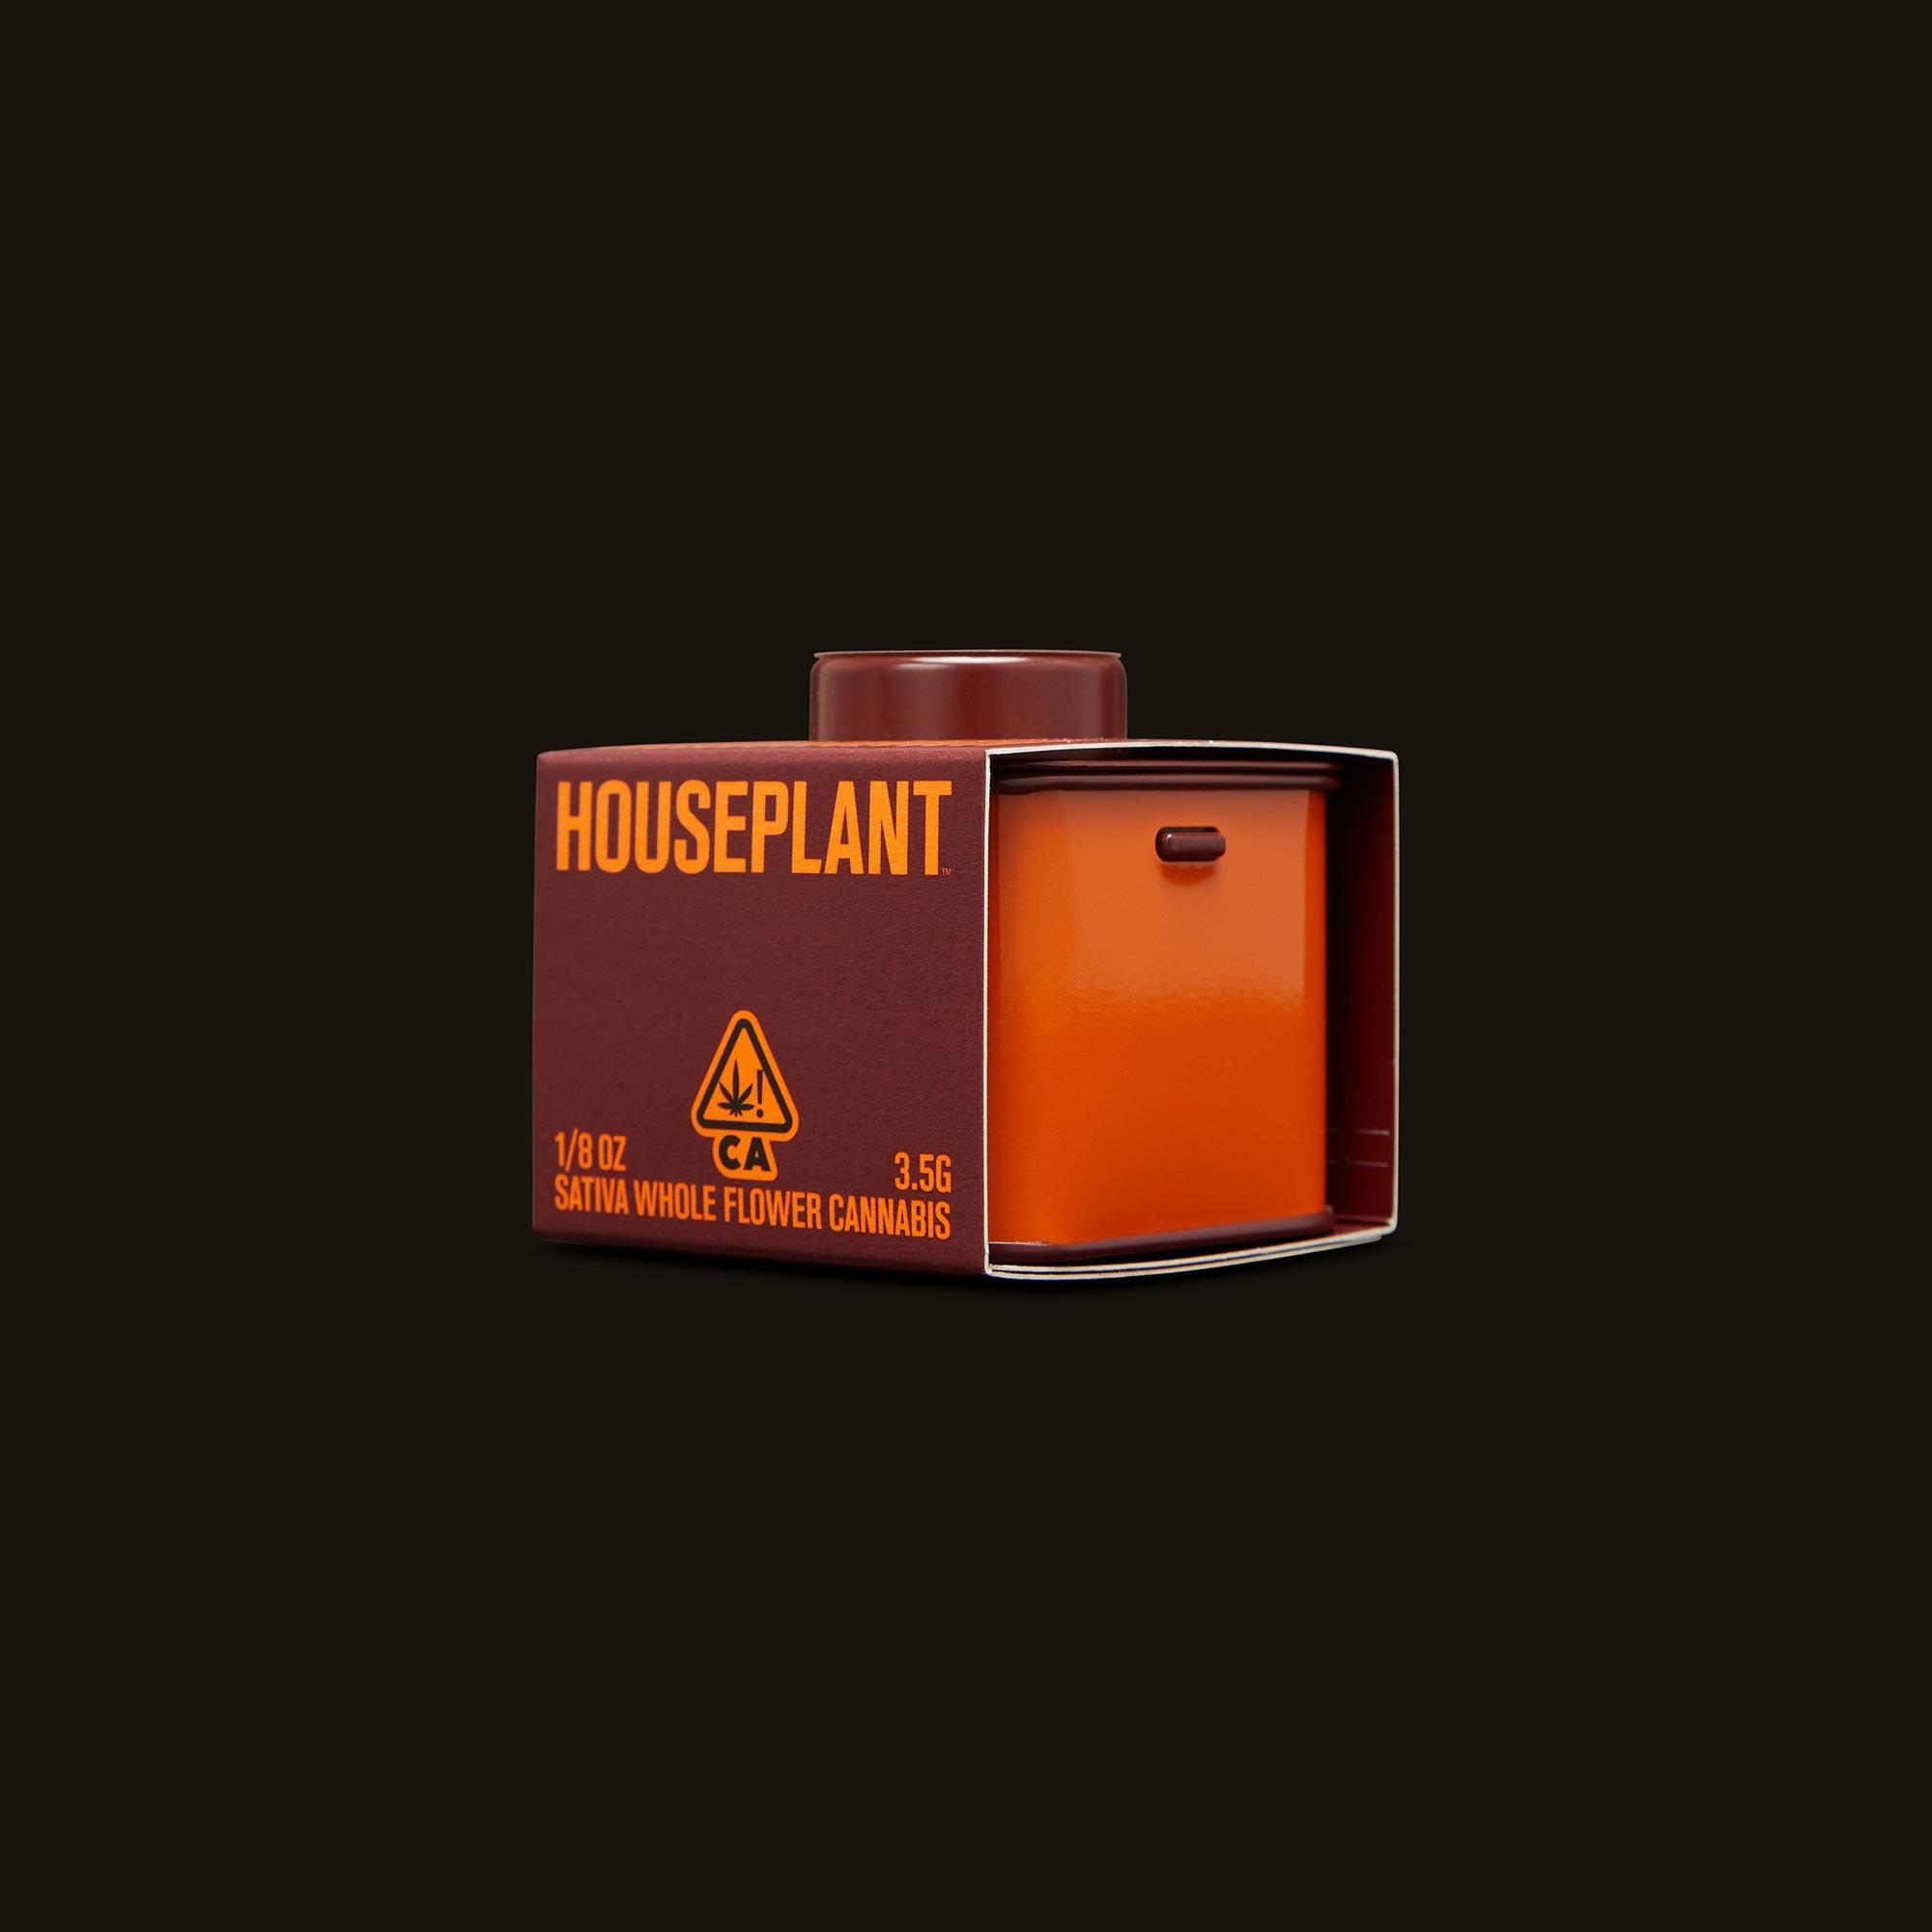 Houseplant Diablo Wind Side Packaging